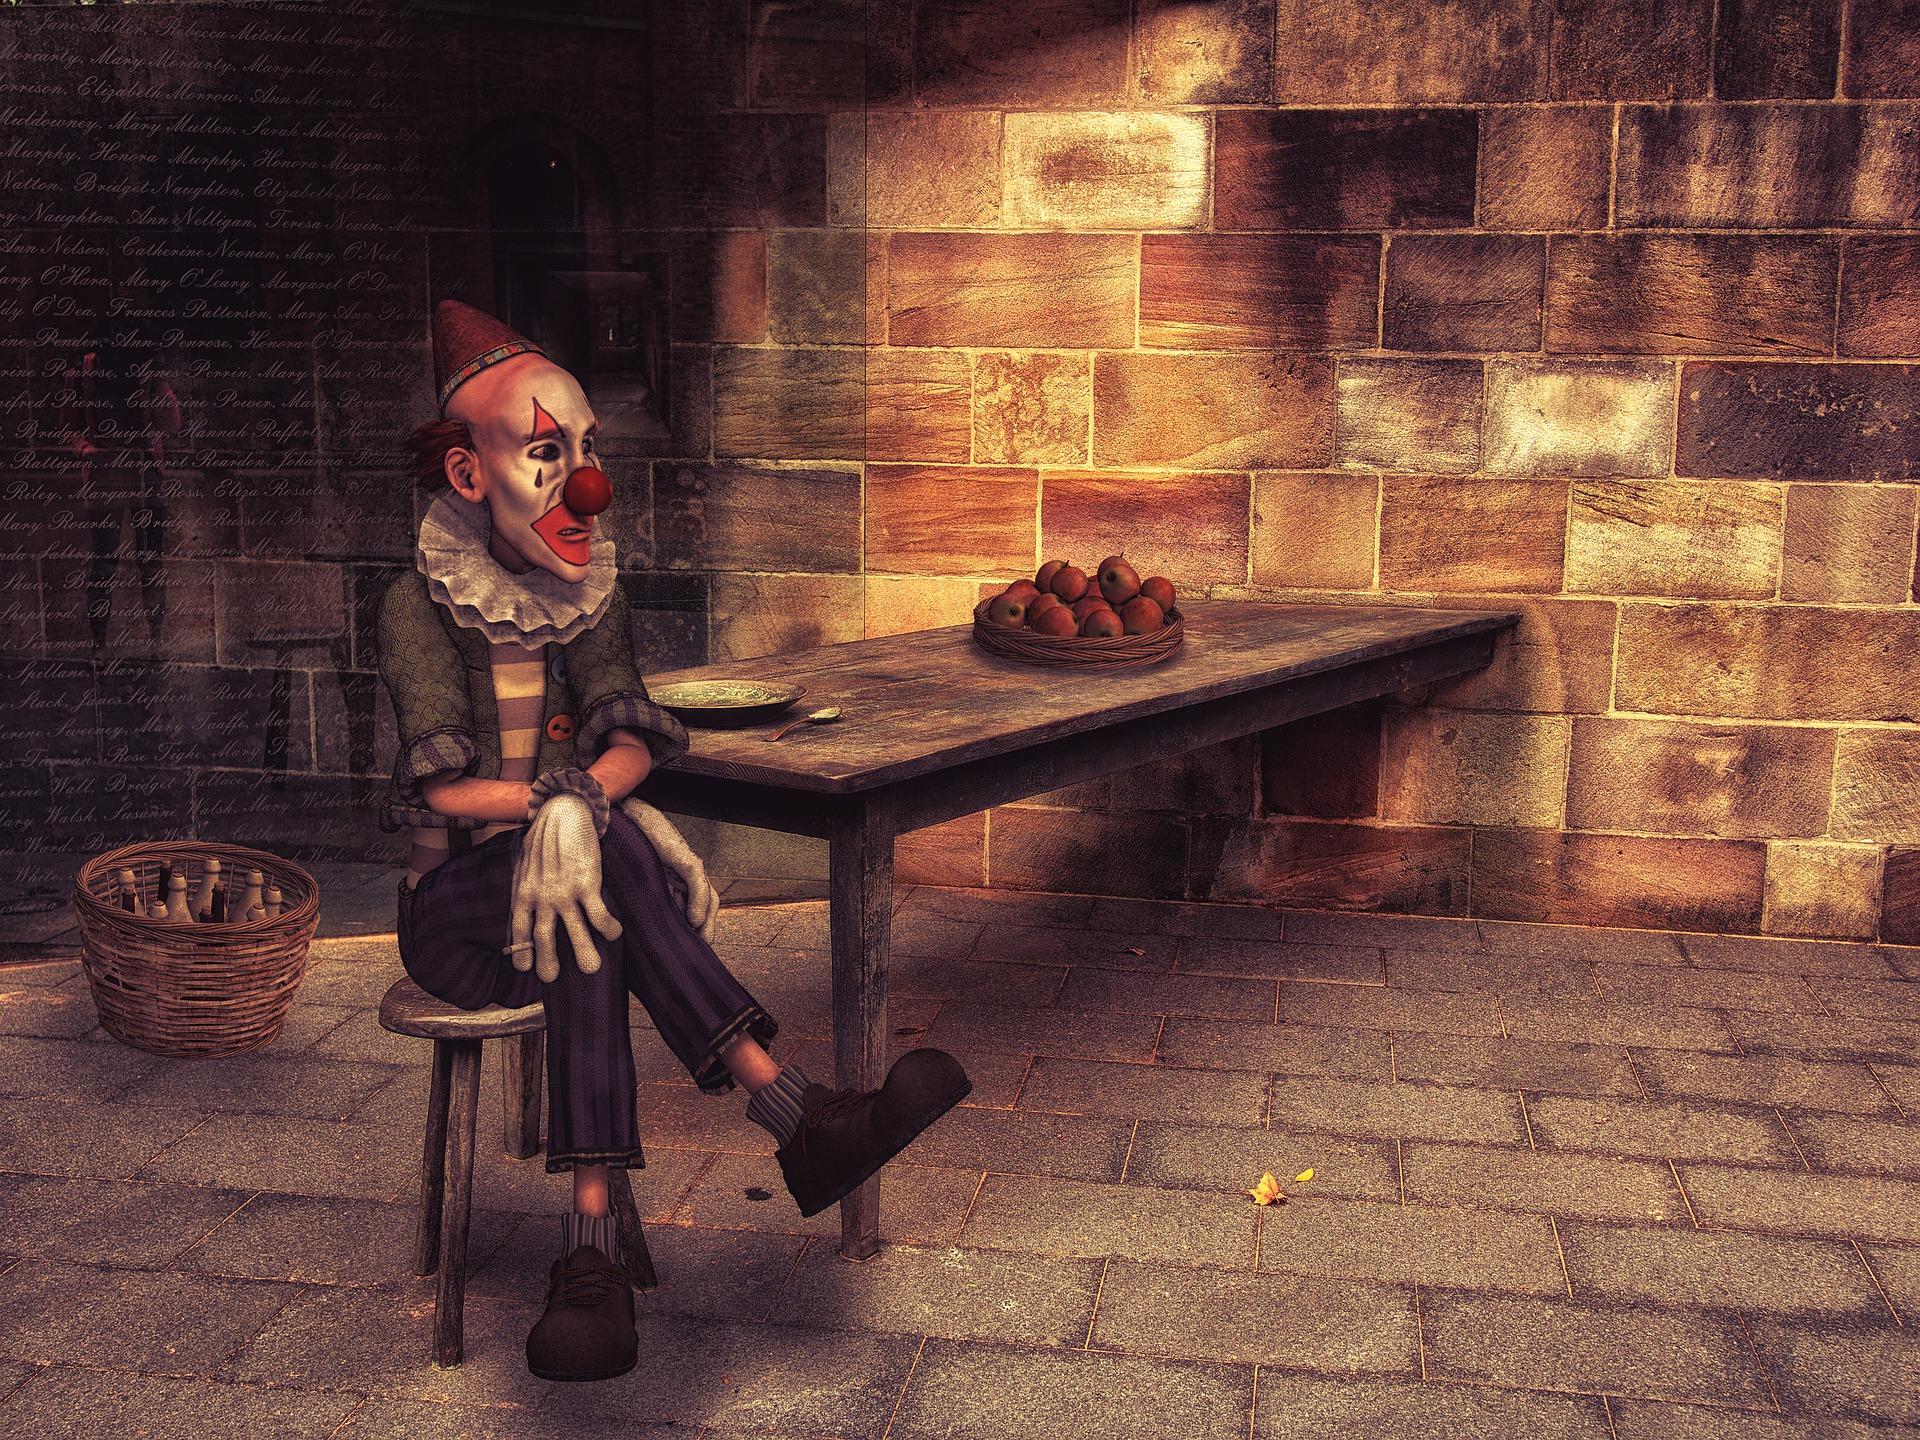 Clown seated